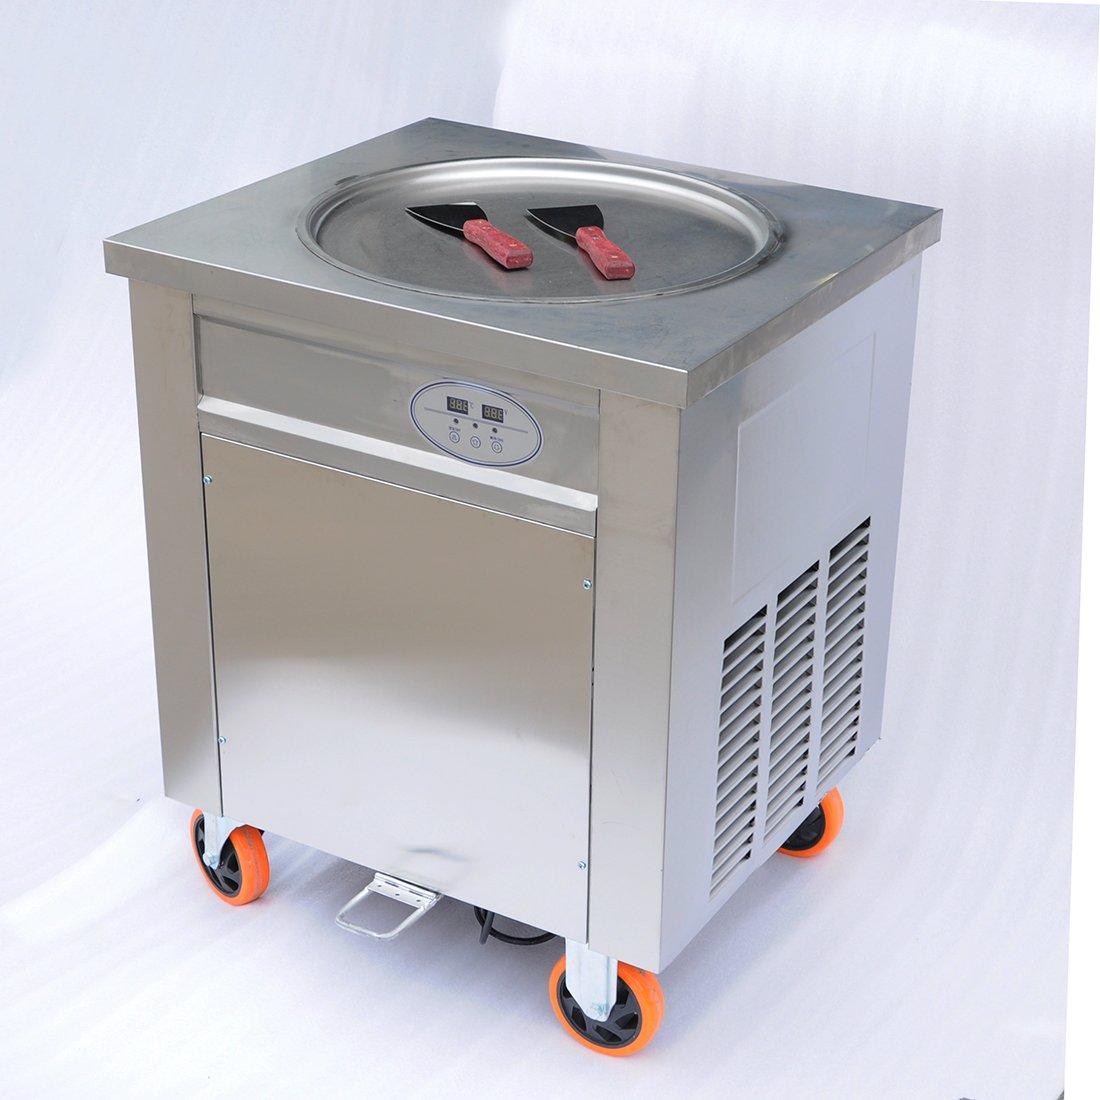 Wotefusi New Fried Ice Cream Machine Flat pan Fried Ice Cream Roll Maker For Fruit,Ice,Milk,Yogurt 900W 110V